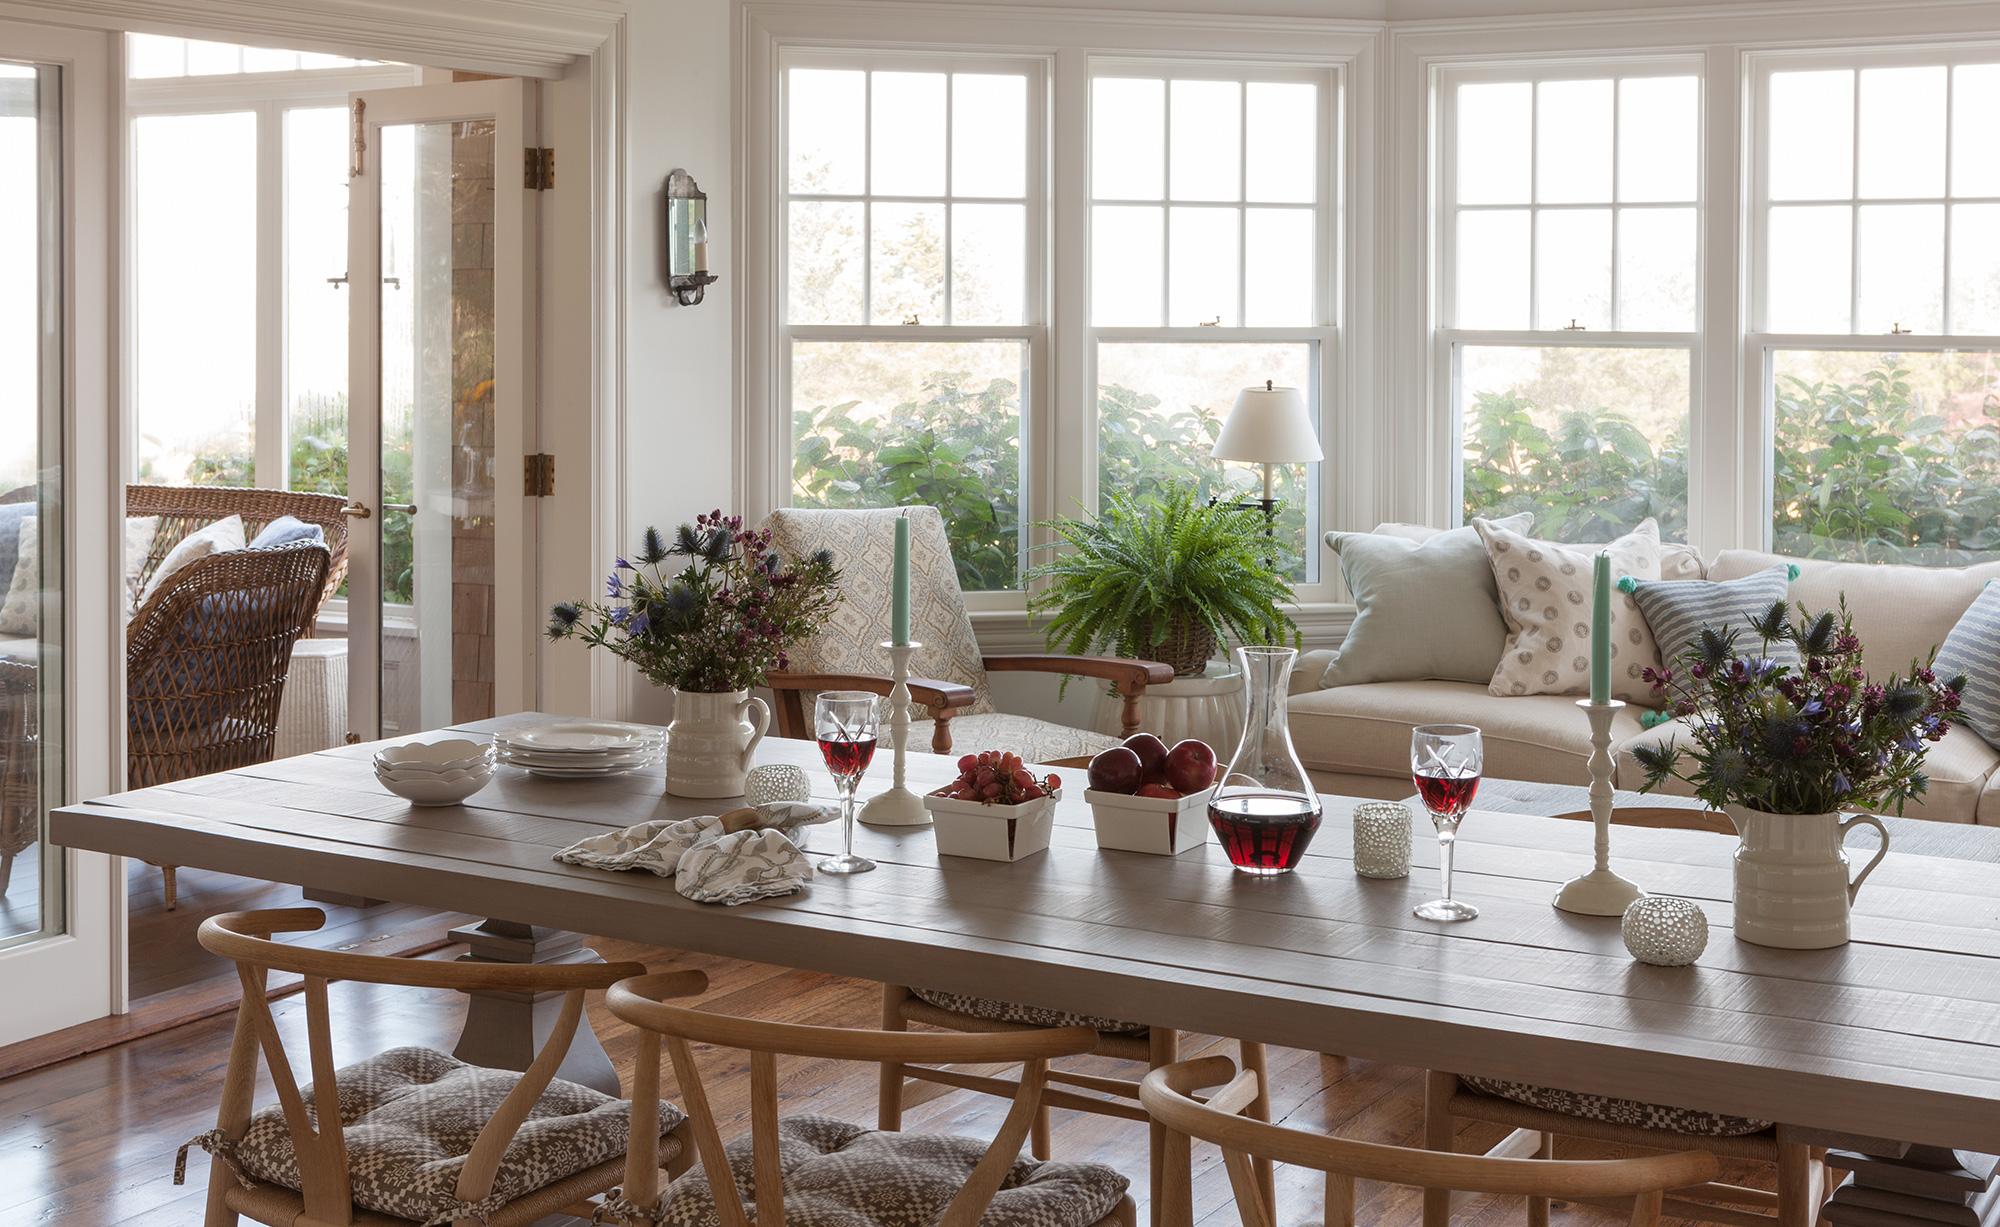 martha 39 s vineyard residence liliane hart interiors. Black Bedroom Furniture Sets. Home Design Ideas